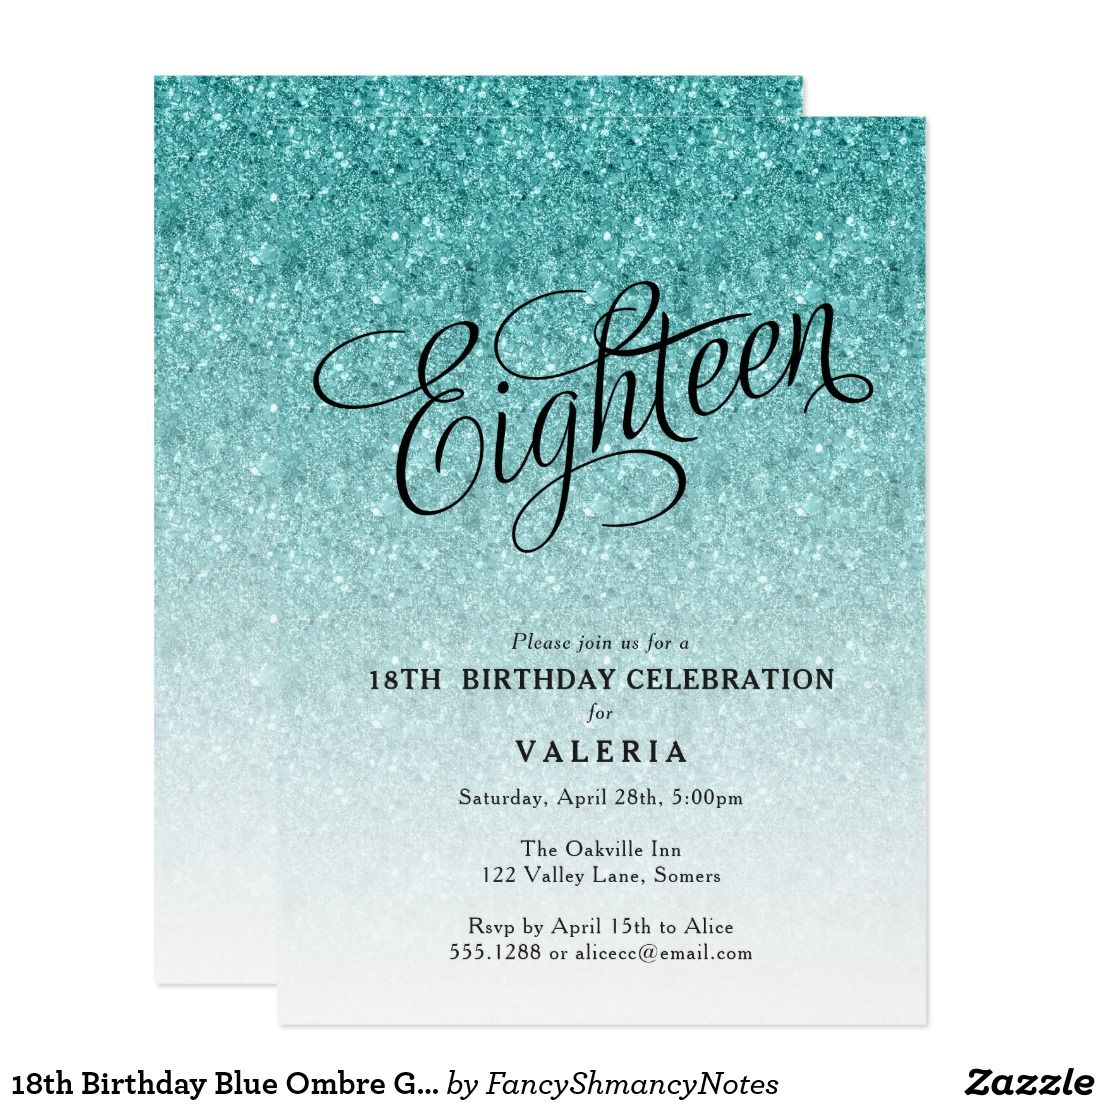 18th birthday blue ombre glitter